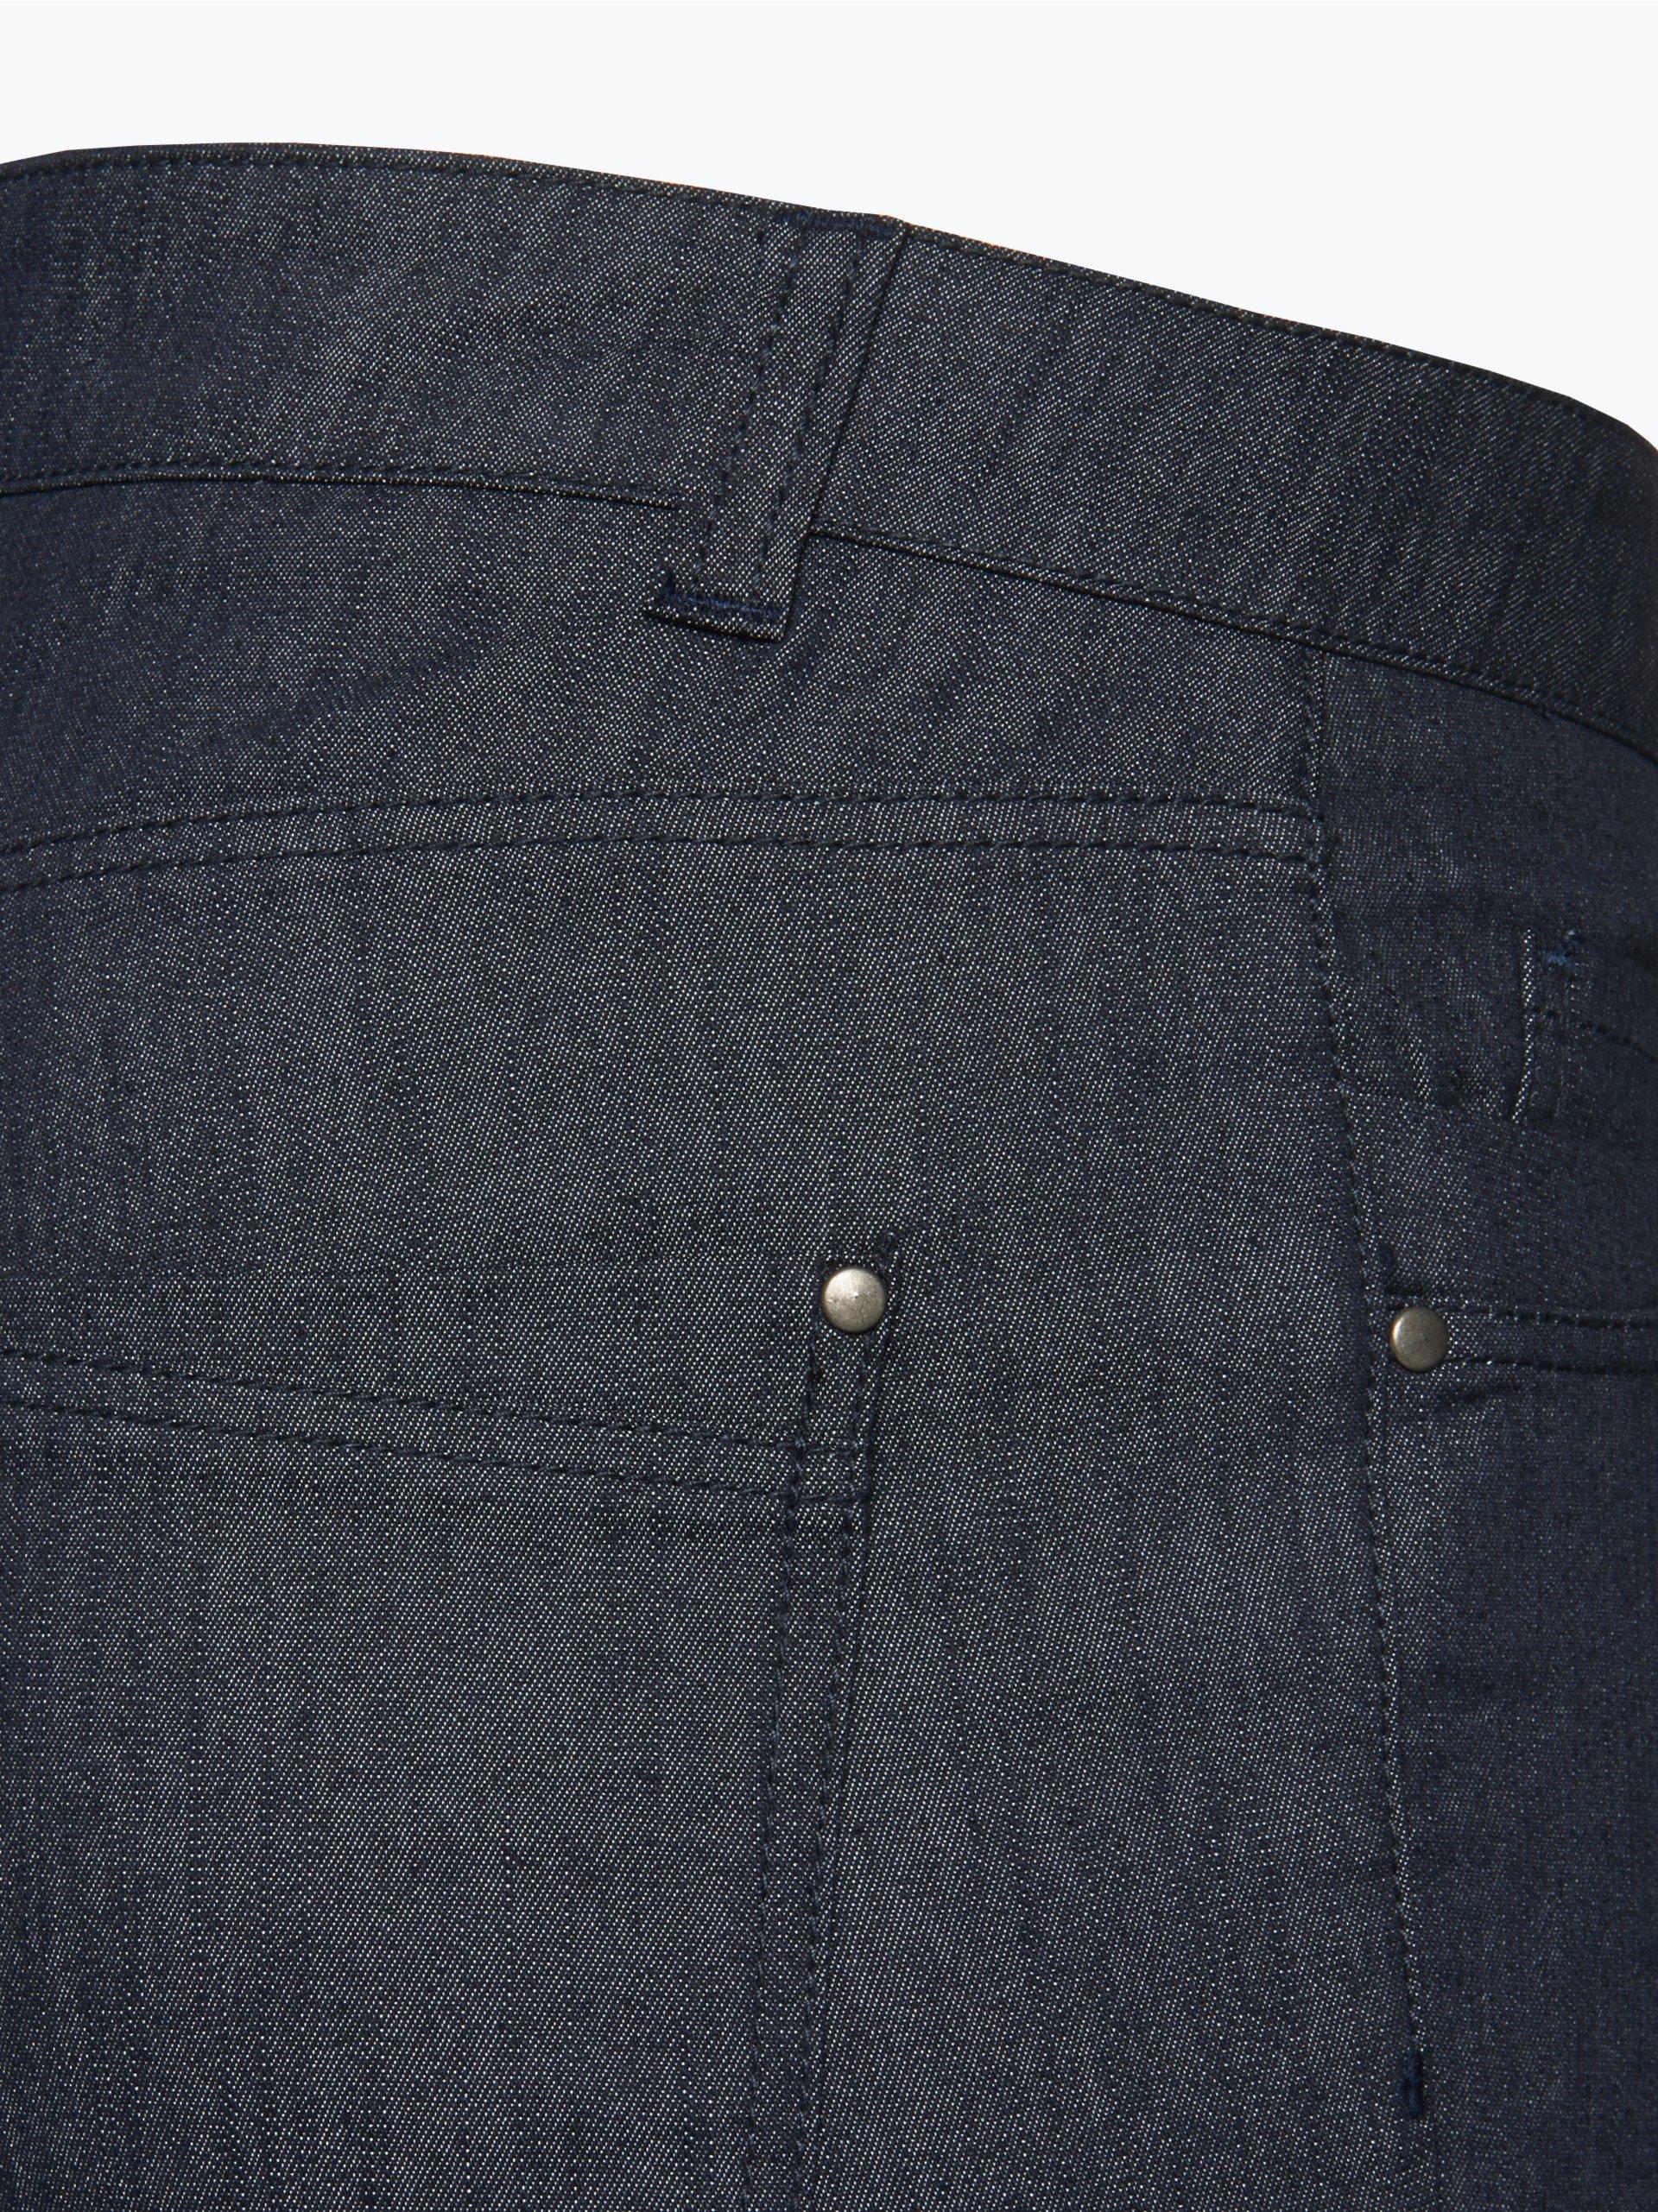 marie lund damen jeans dark stone uni online kaufen vangraaf com. Black Bedroom Furniture Sets. Home Design Ideas